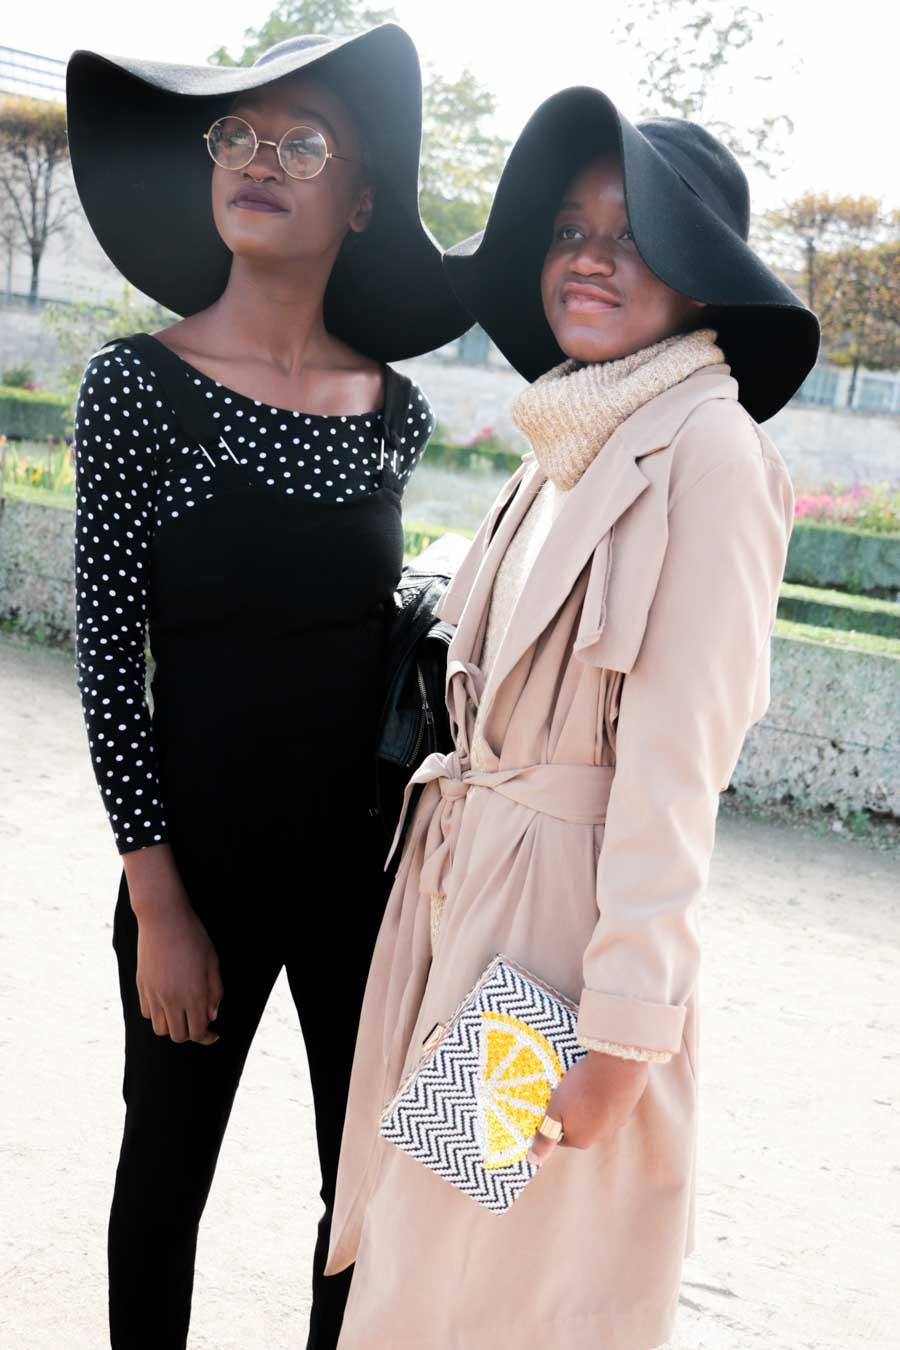 floppy-hats-paris-street-style-1